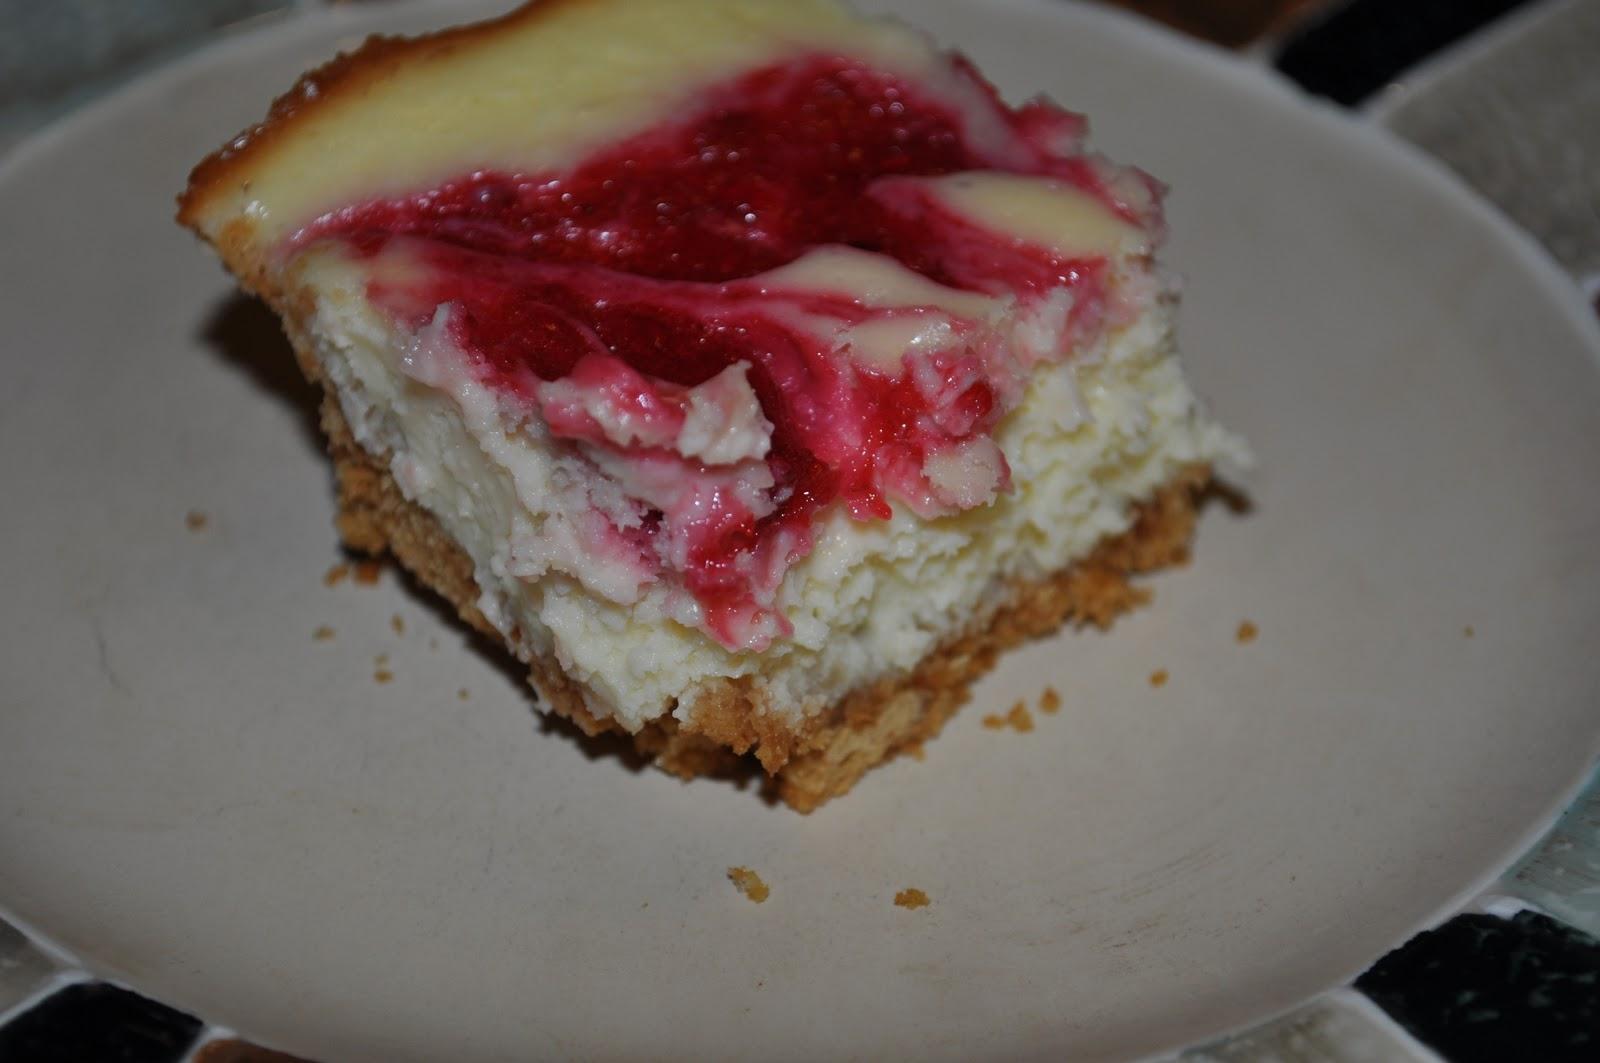 Beth's Favorite Recipes: Strawberry Swirl Cheesecake Bars